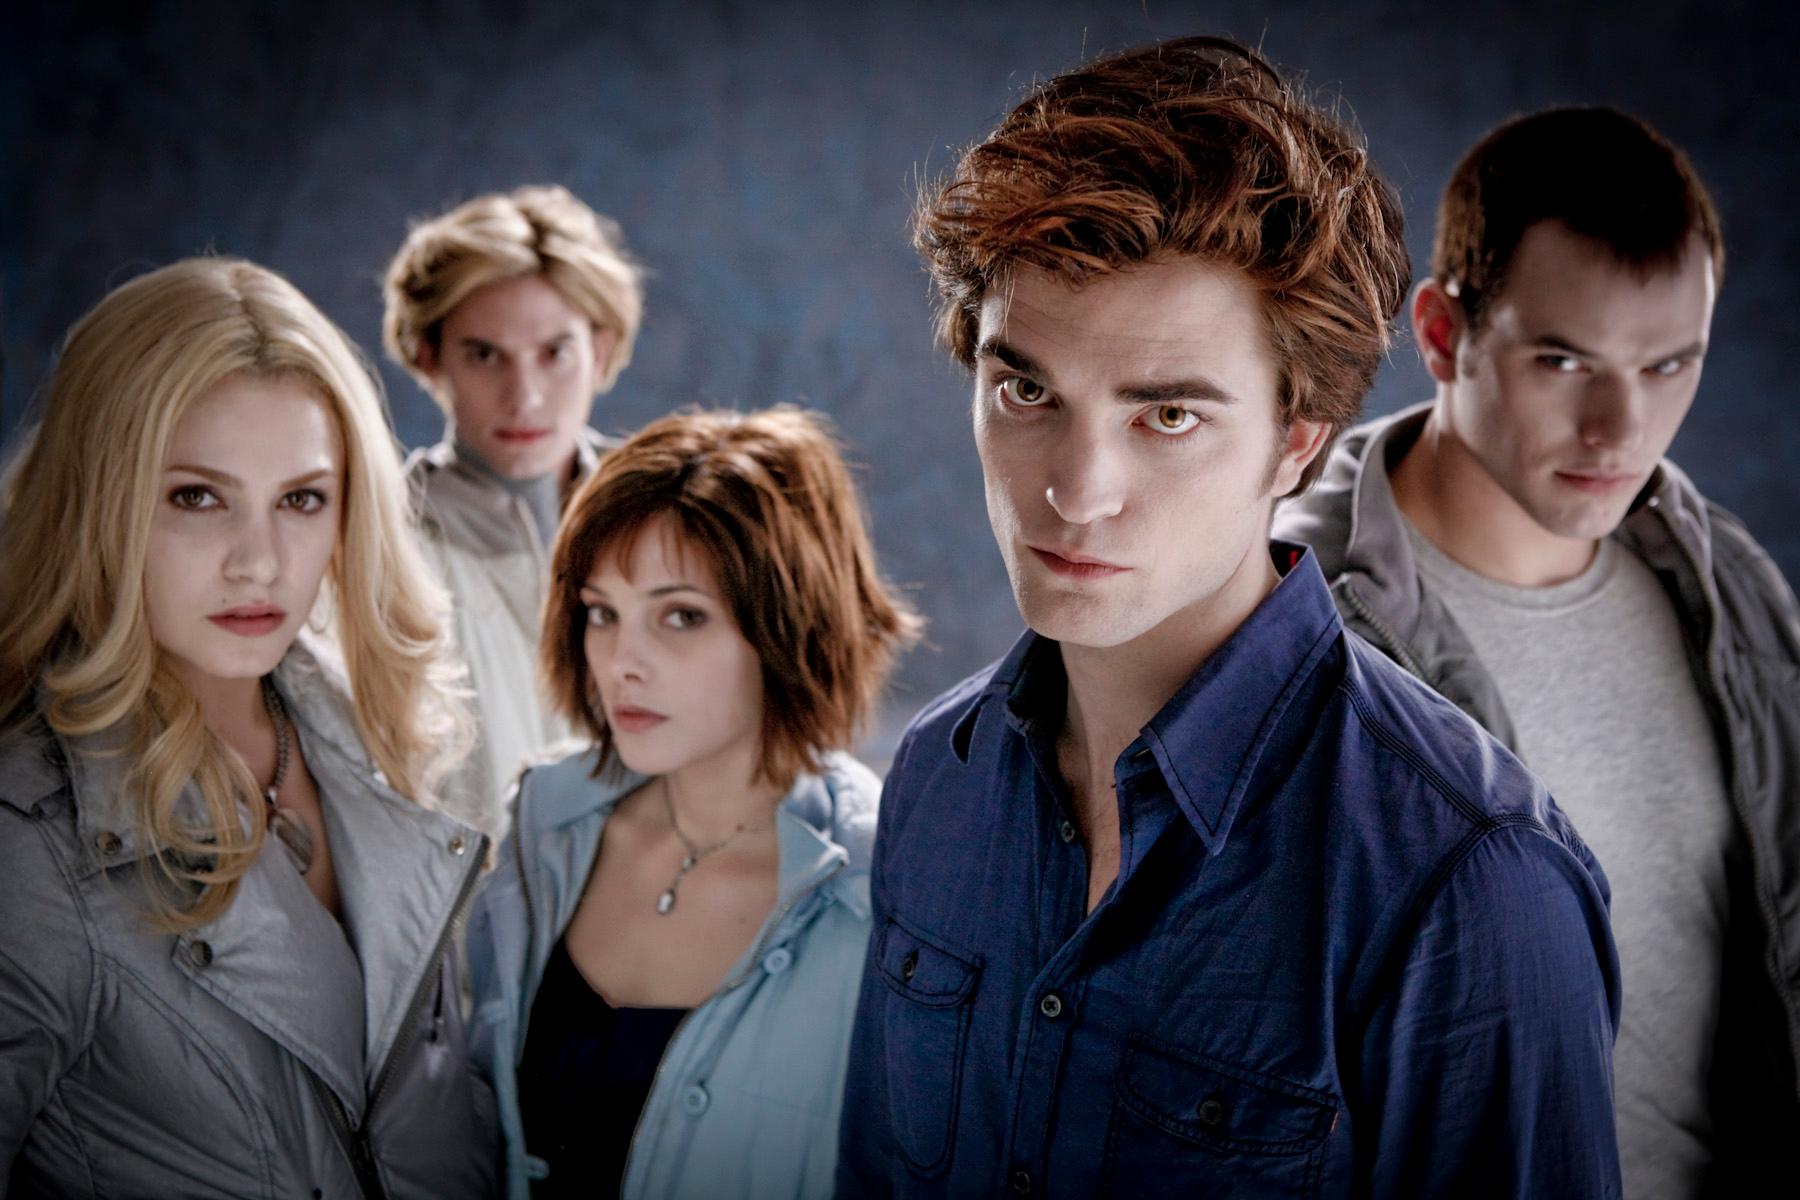 Cast of the film Twilight